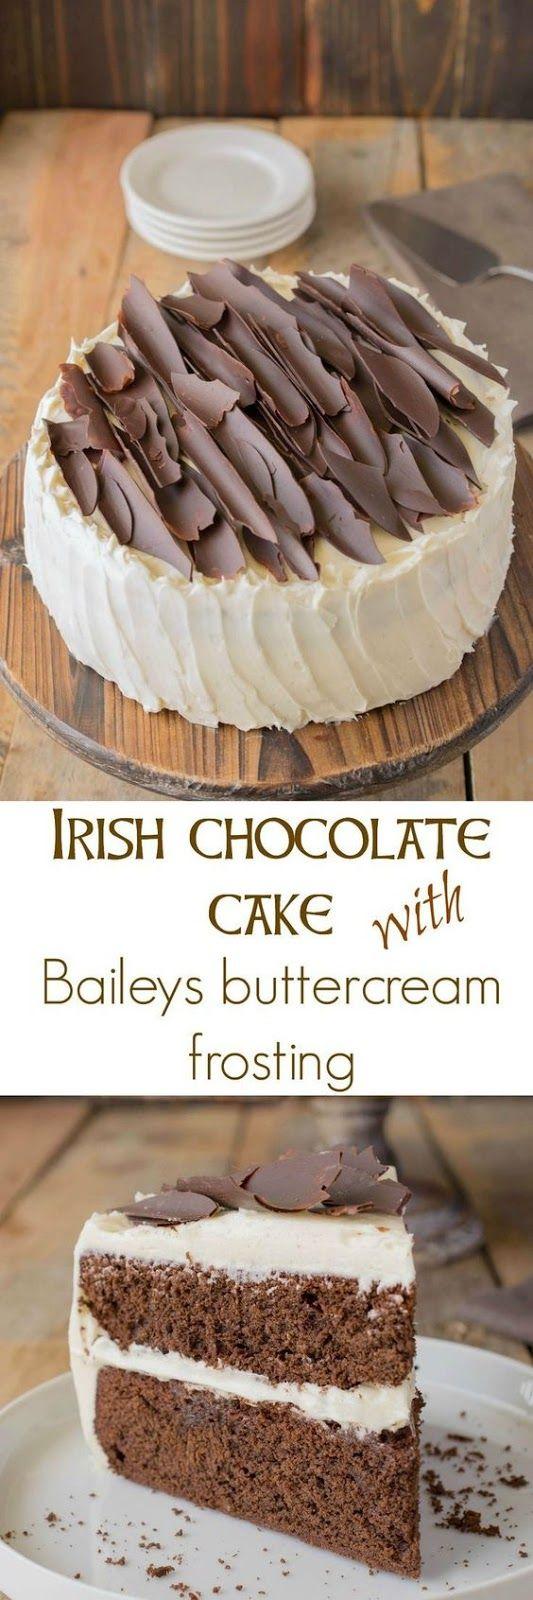 Irish Chocolate Cake with Baileys Buttercream Frosting Recipe - Popular Recipes of Food Blog